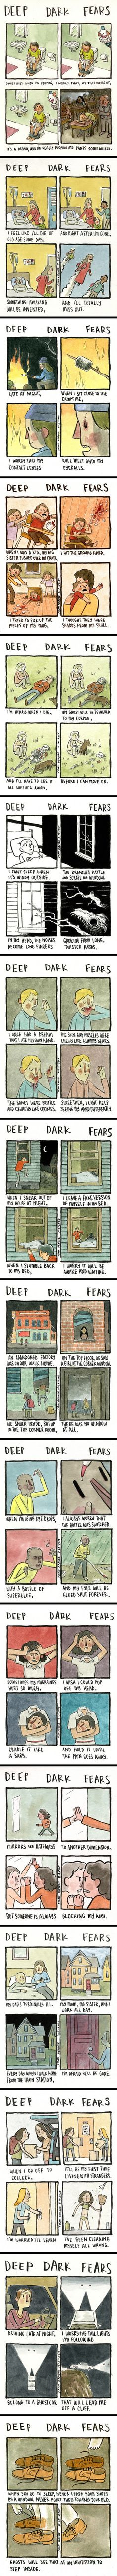 Trendy Quotes Deep Dark Sad So True - Zitate Cute Comics, Funny Comics, Deep Dark Fears, Trauma, The Awkward Yeti, Creepy Stories, Short Comics, New Quotes, True Quotes